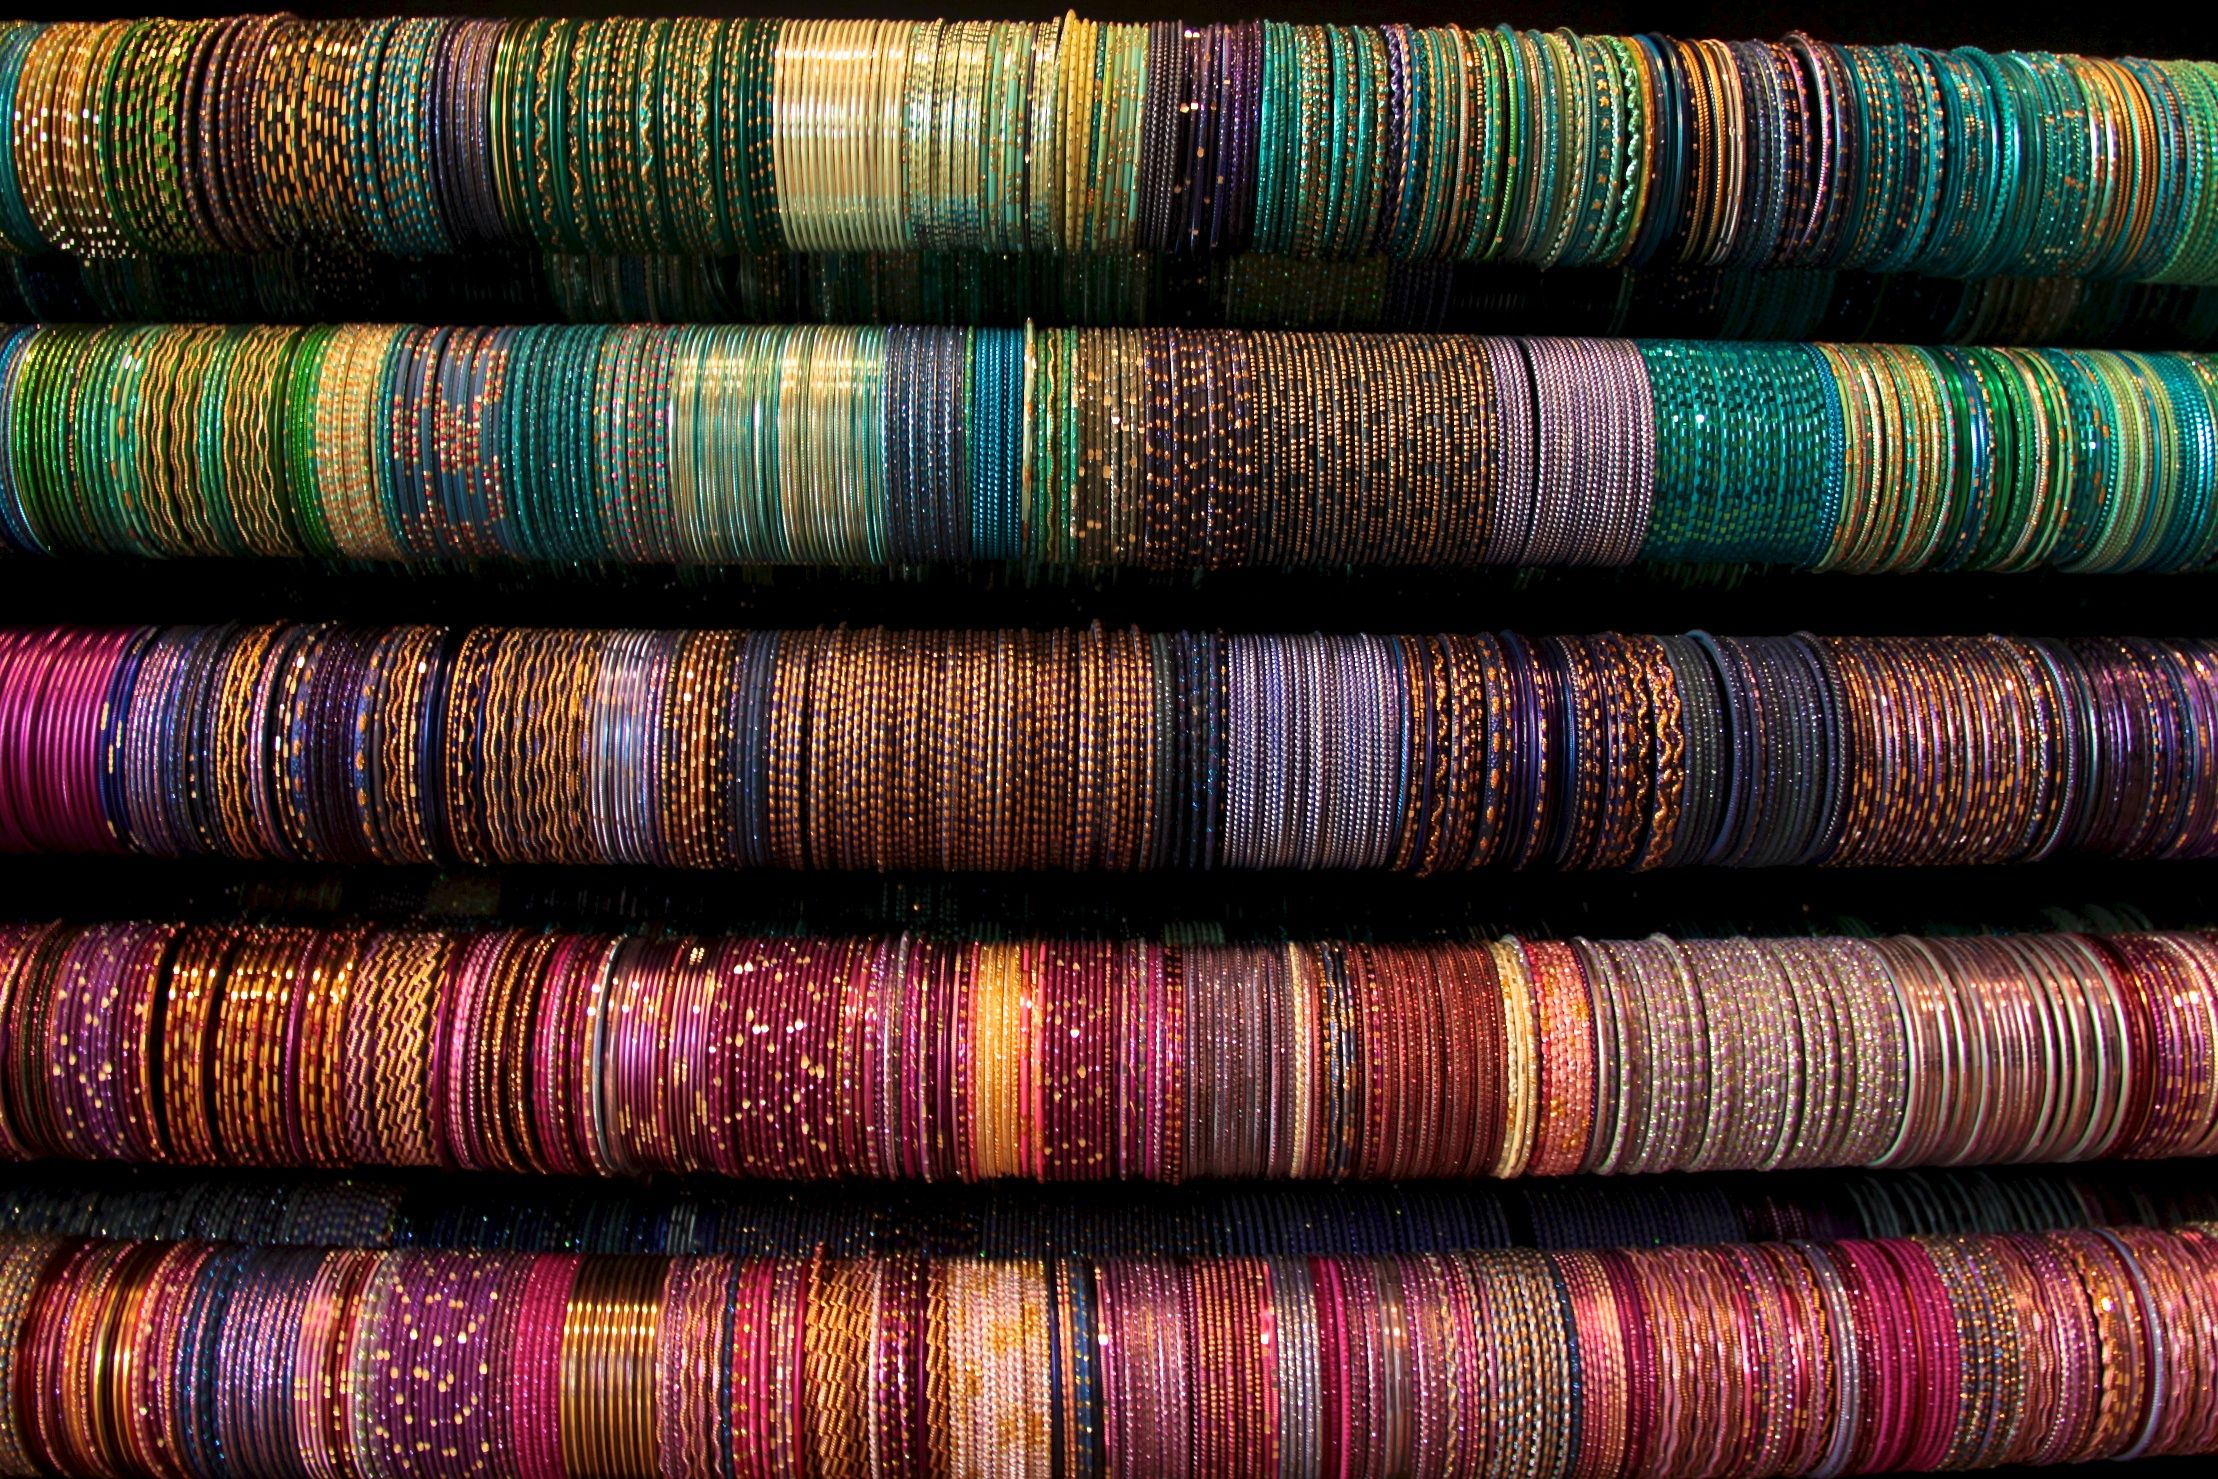 Bangles Shop Little India, Singapore - Food, Drink, Culture ...